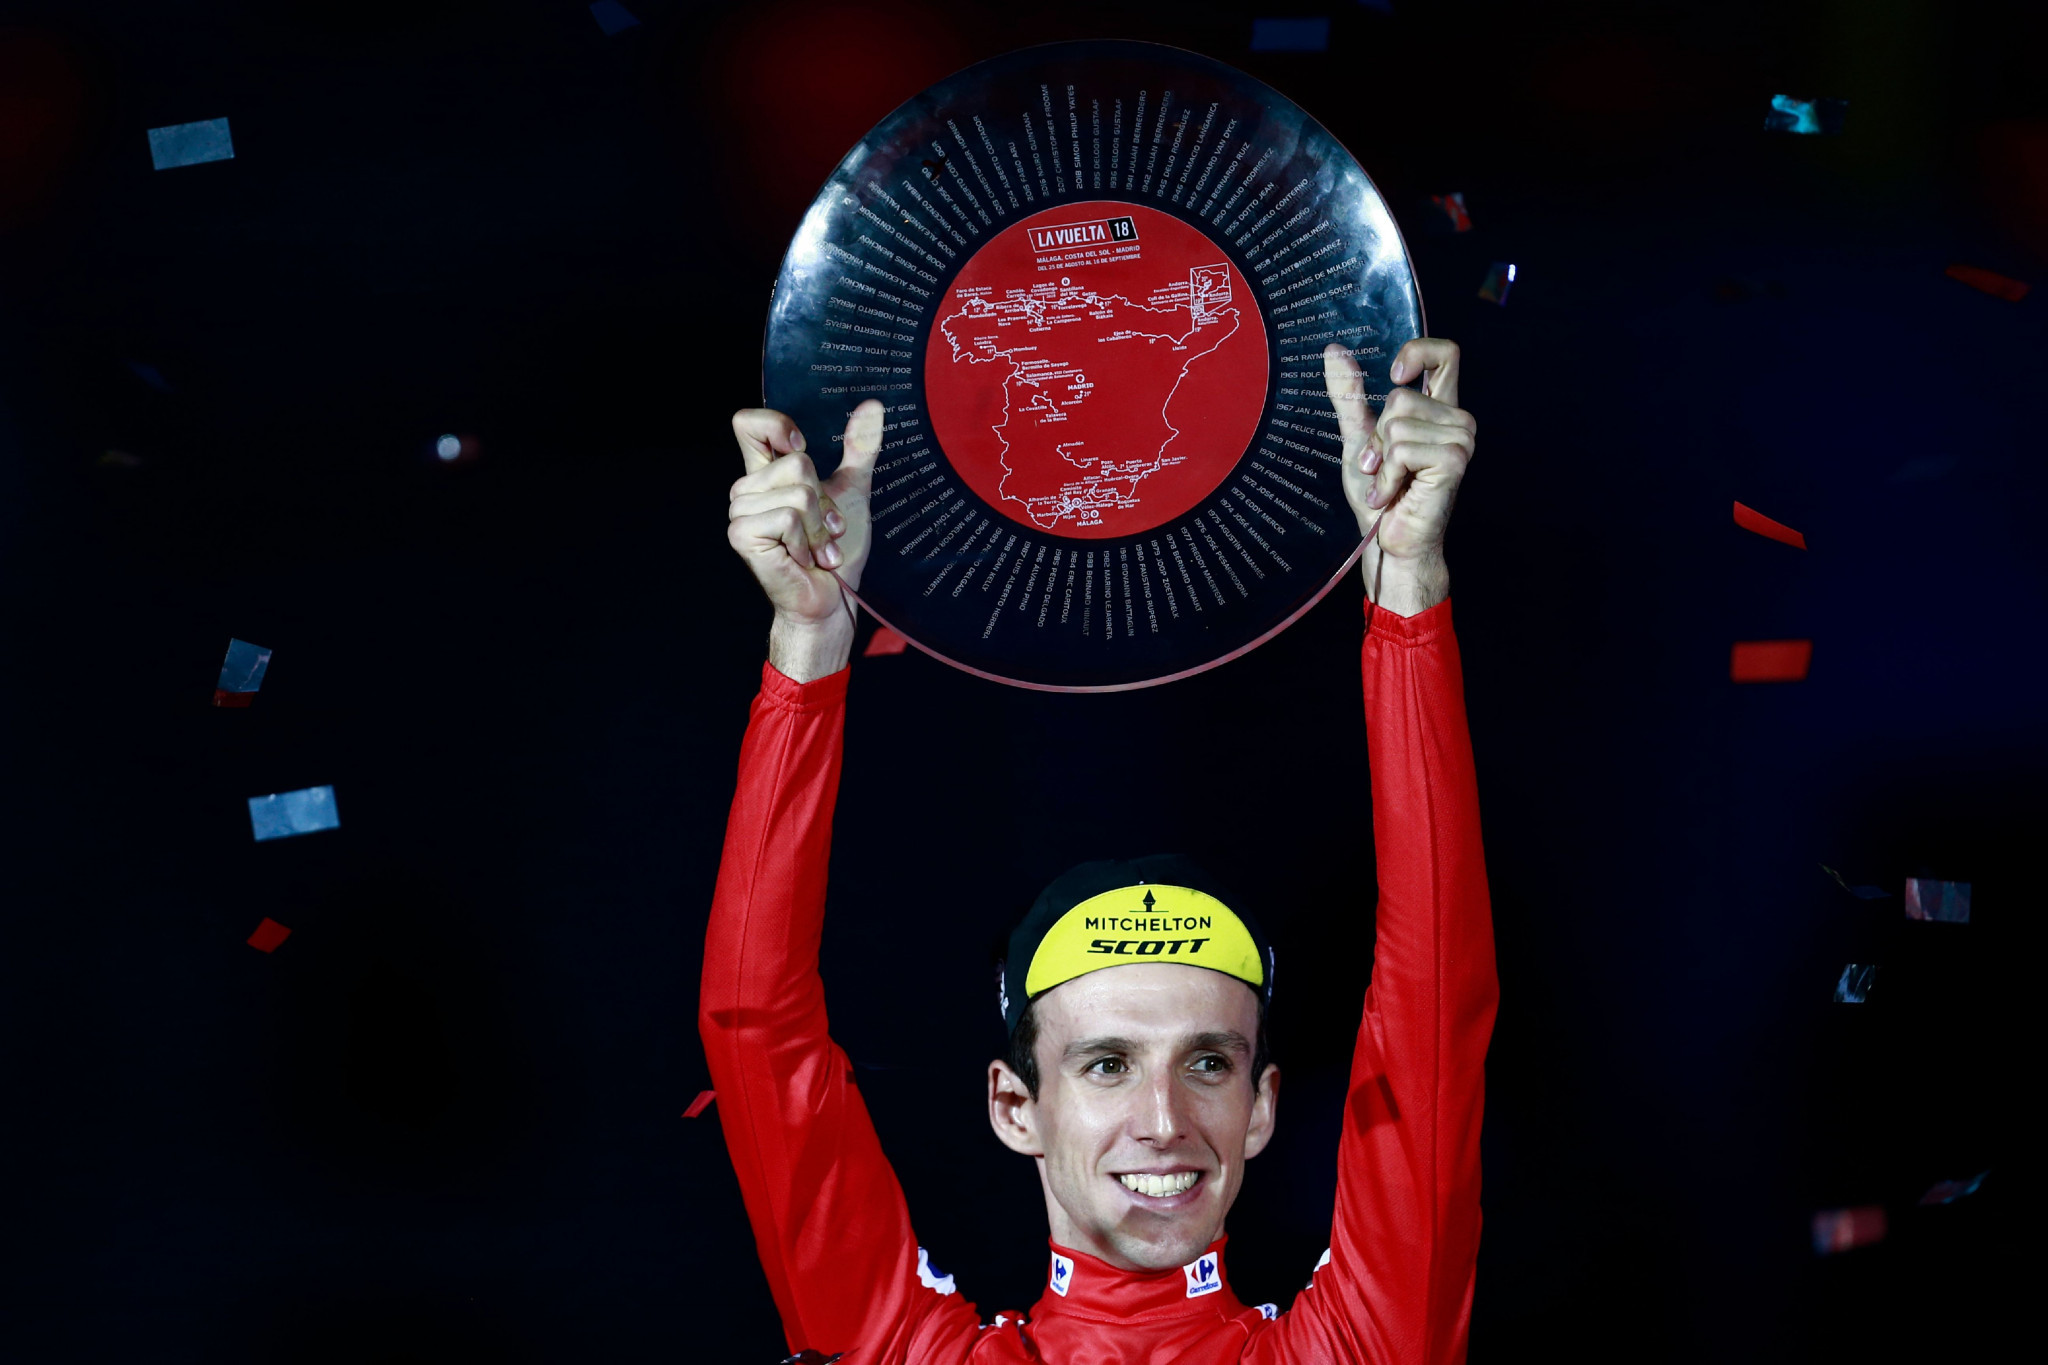 Yates confirmed as Vuelta a España winner to continue British Grand Tour domination